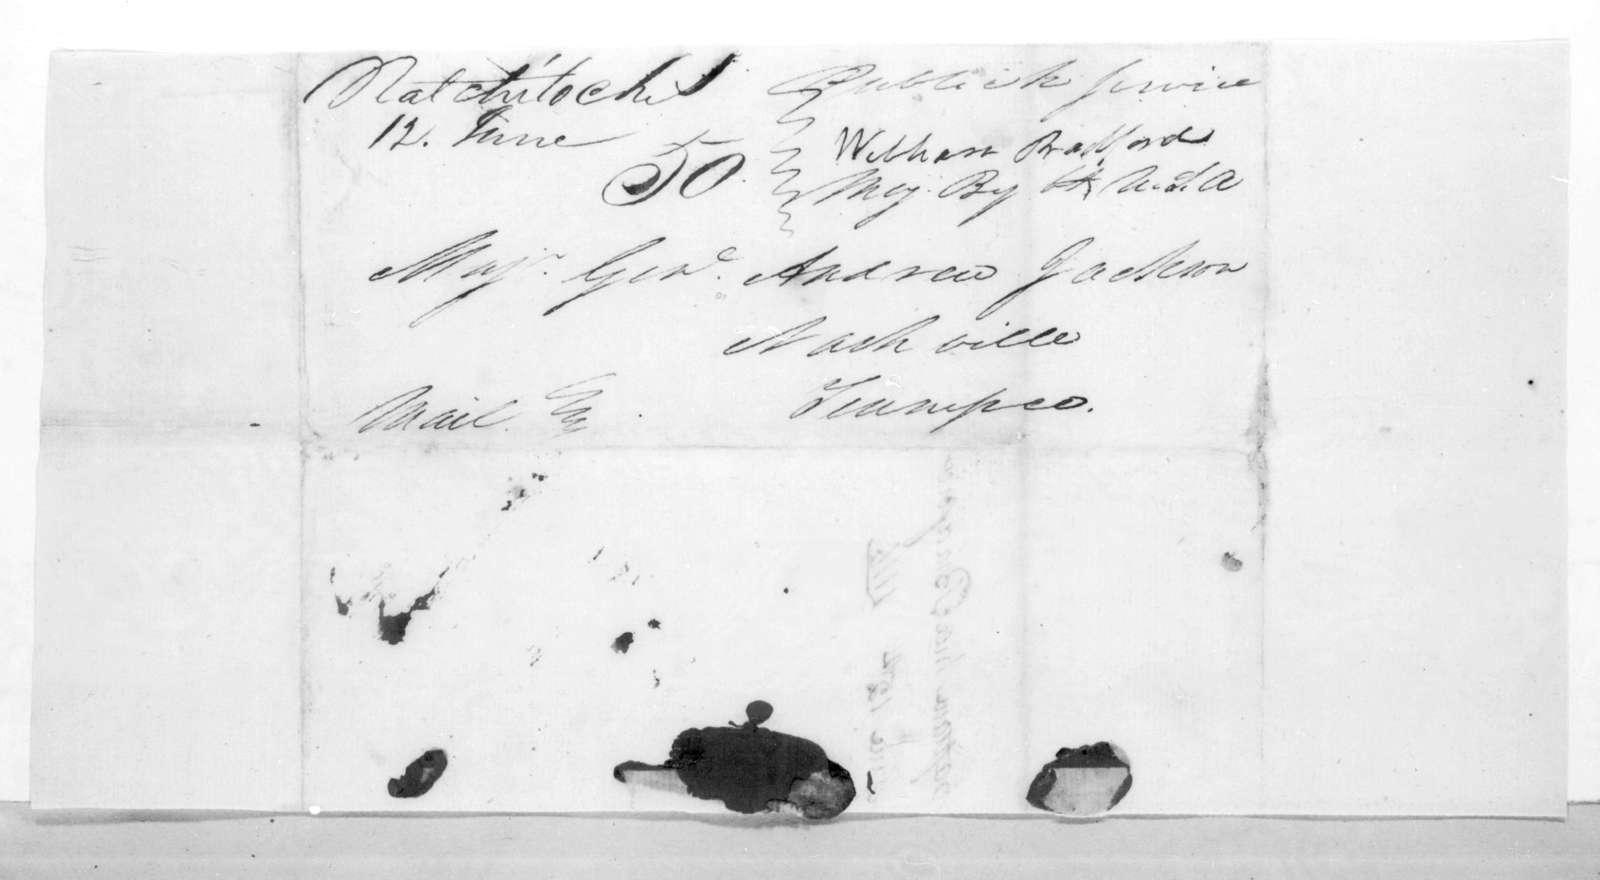 William Bradford to Andrew Jackson, June 12, 1816